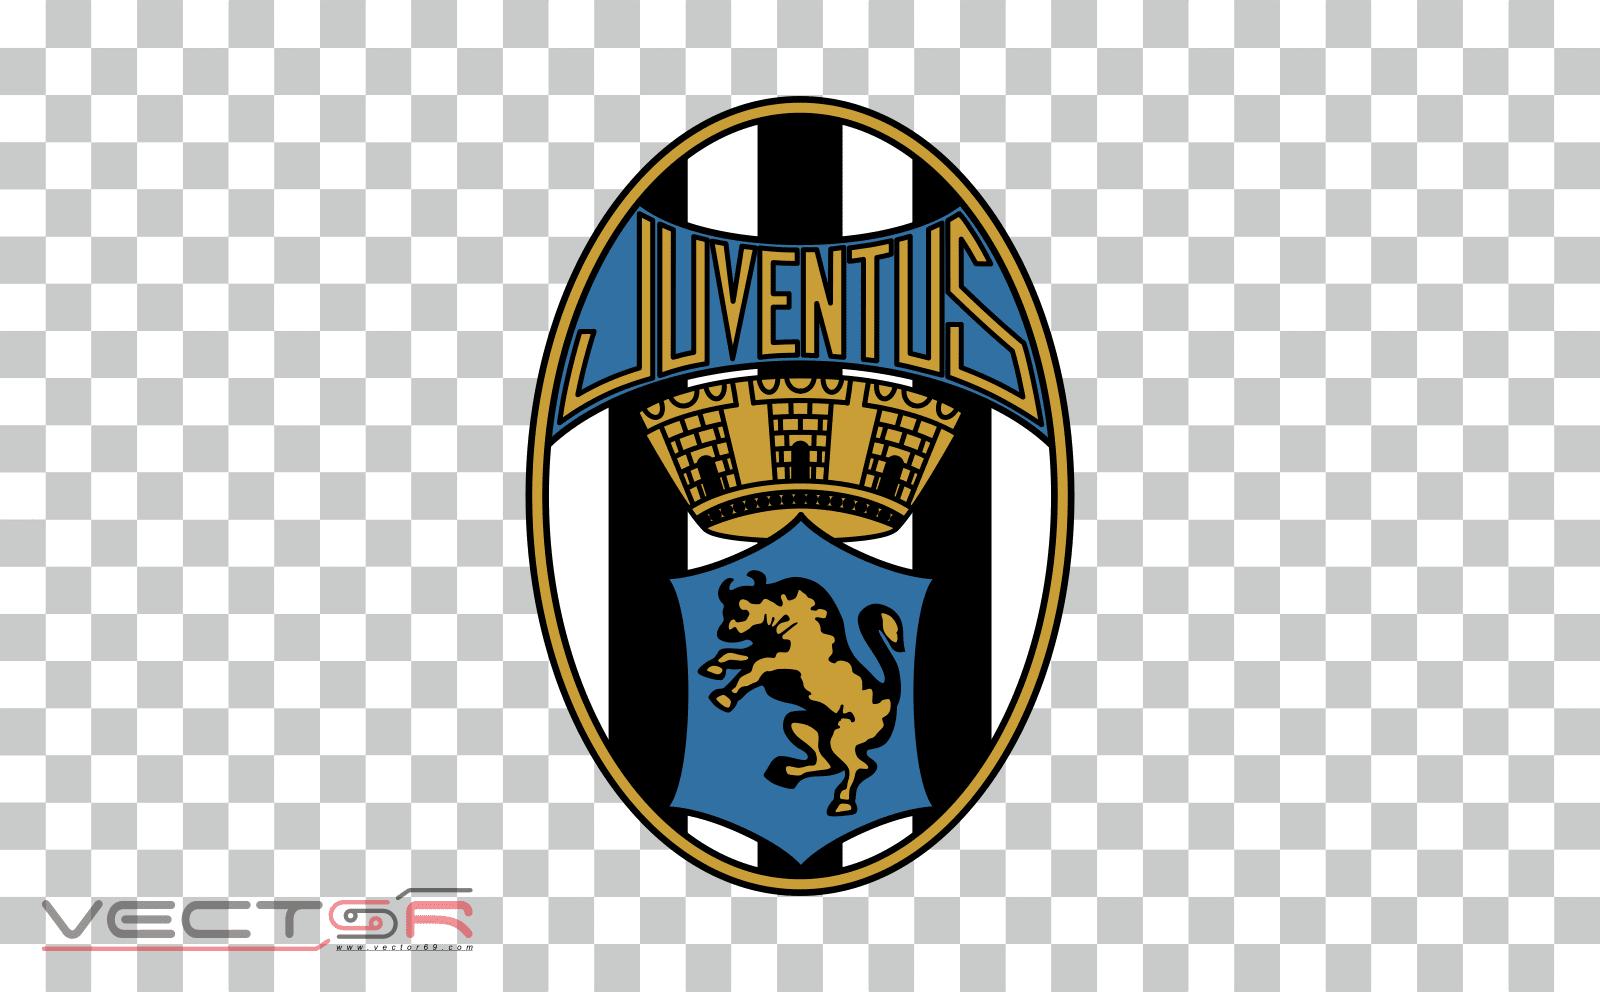 Juventus F.C. (1931) Logo - Download .PNG (Portable Network Graphics) Transparent Images